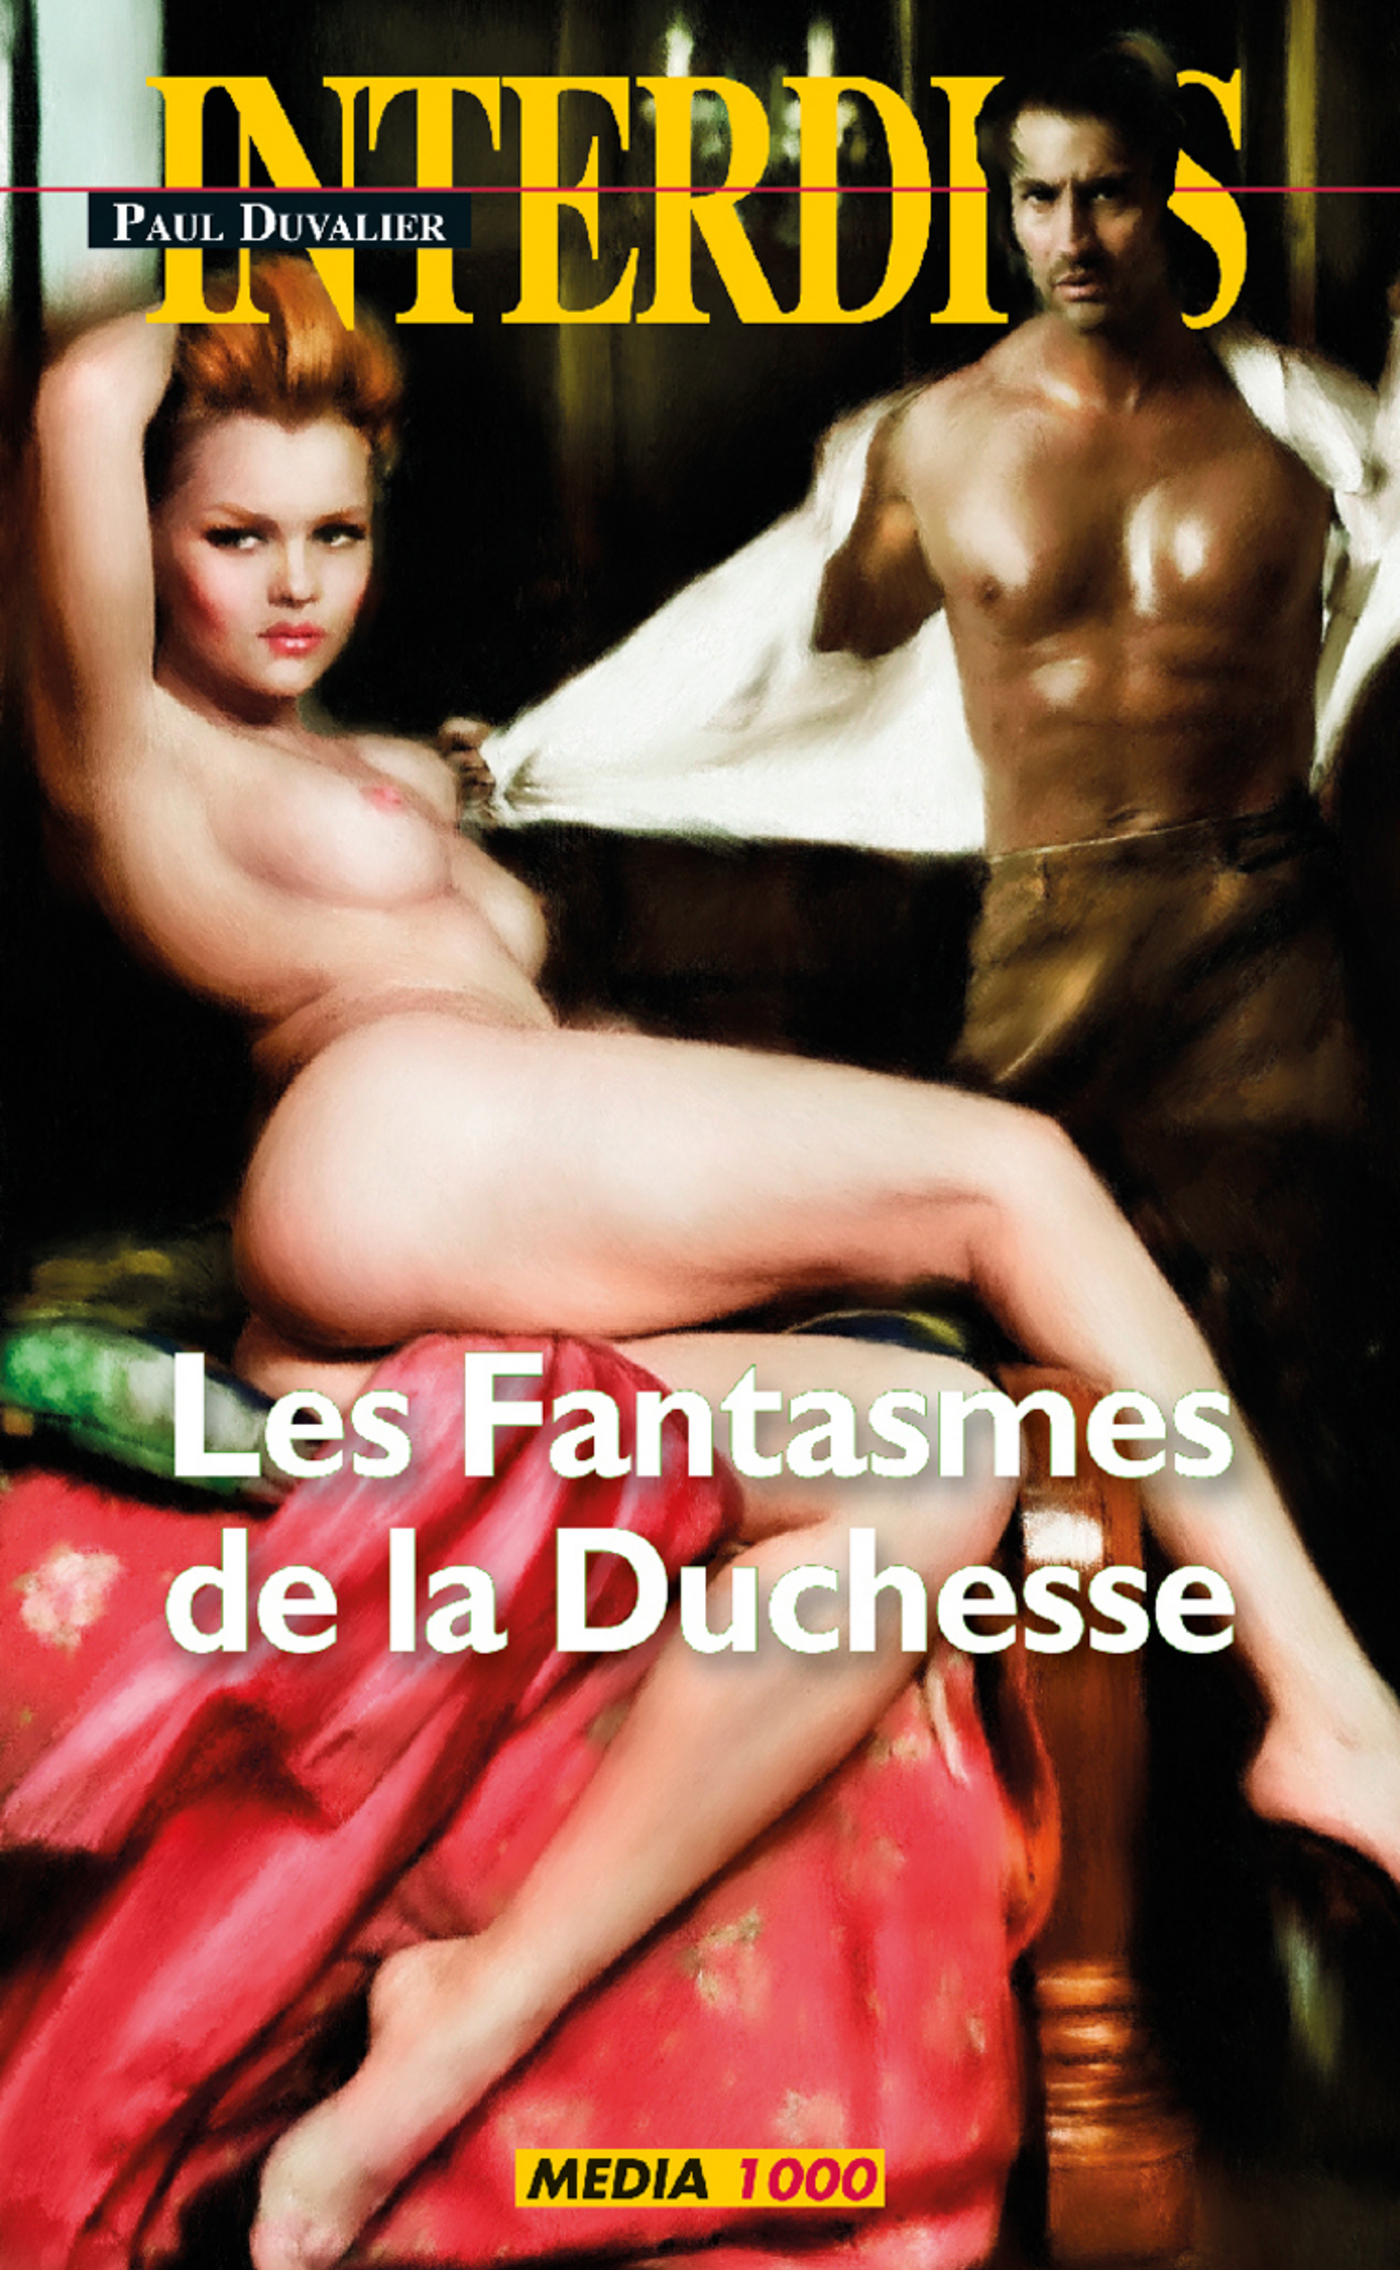 Les fantasmes de la duchesse (ebook)